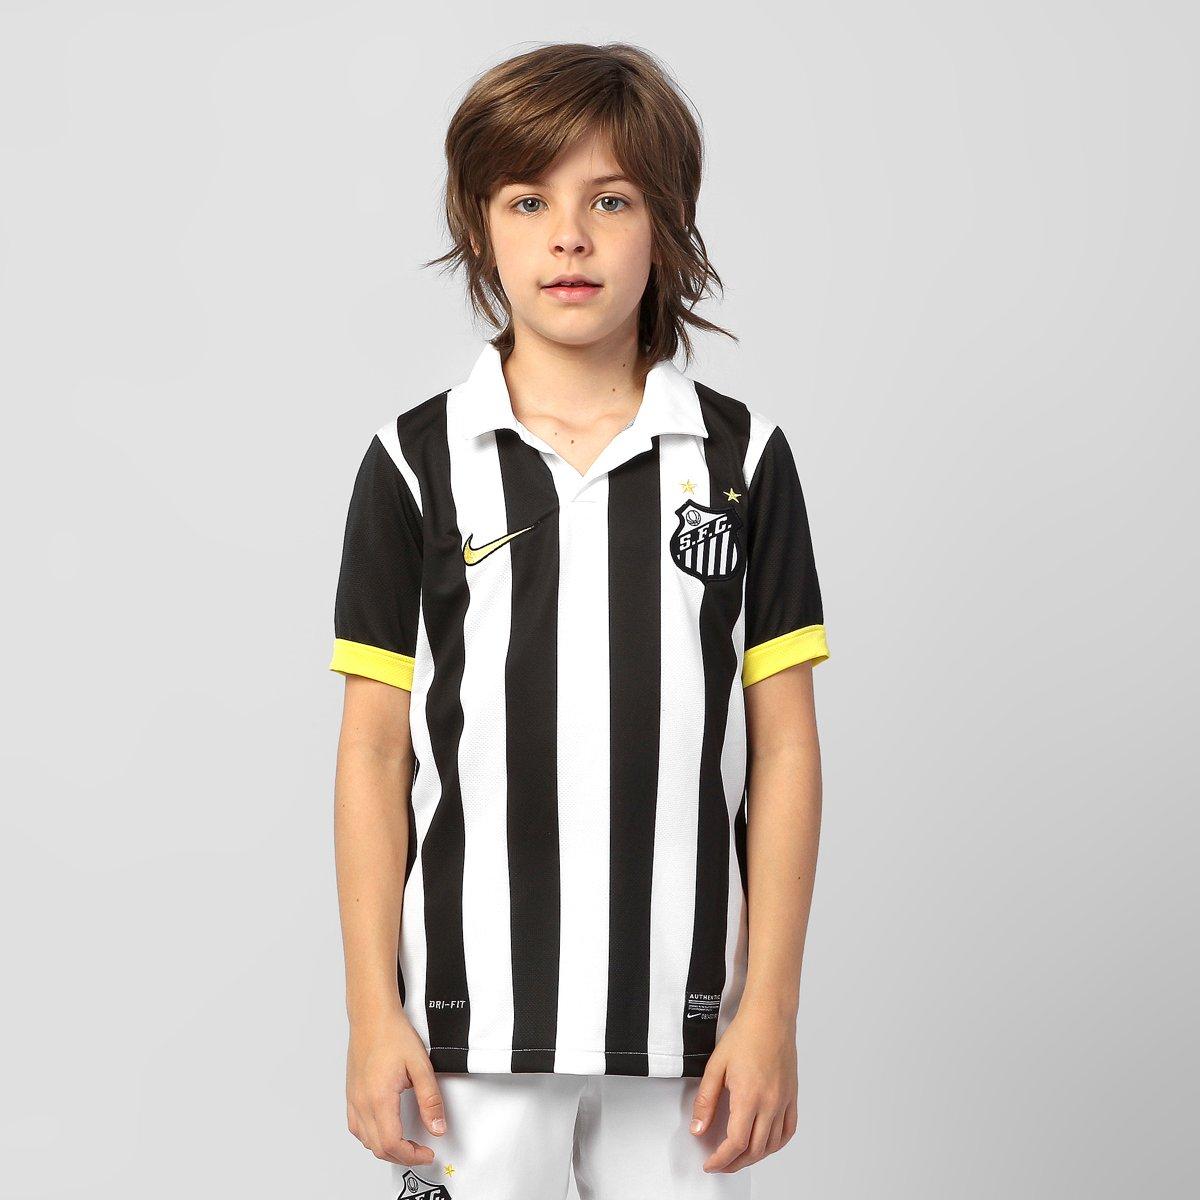 778069ae74 Camisa Nike Santos II 13 14 s nº Juvenil - Compre Agora